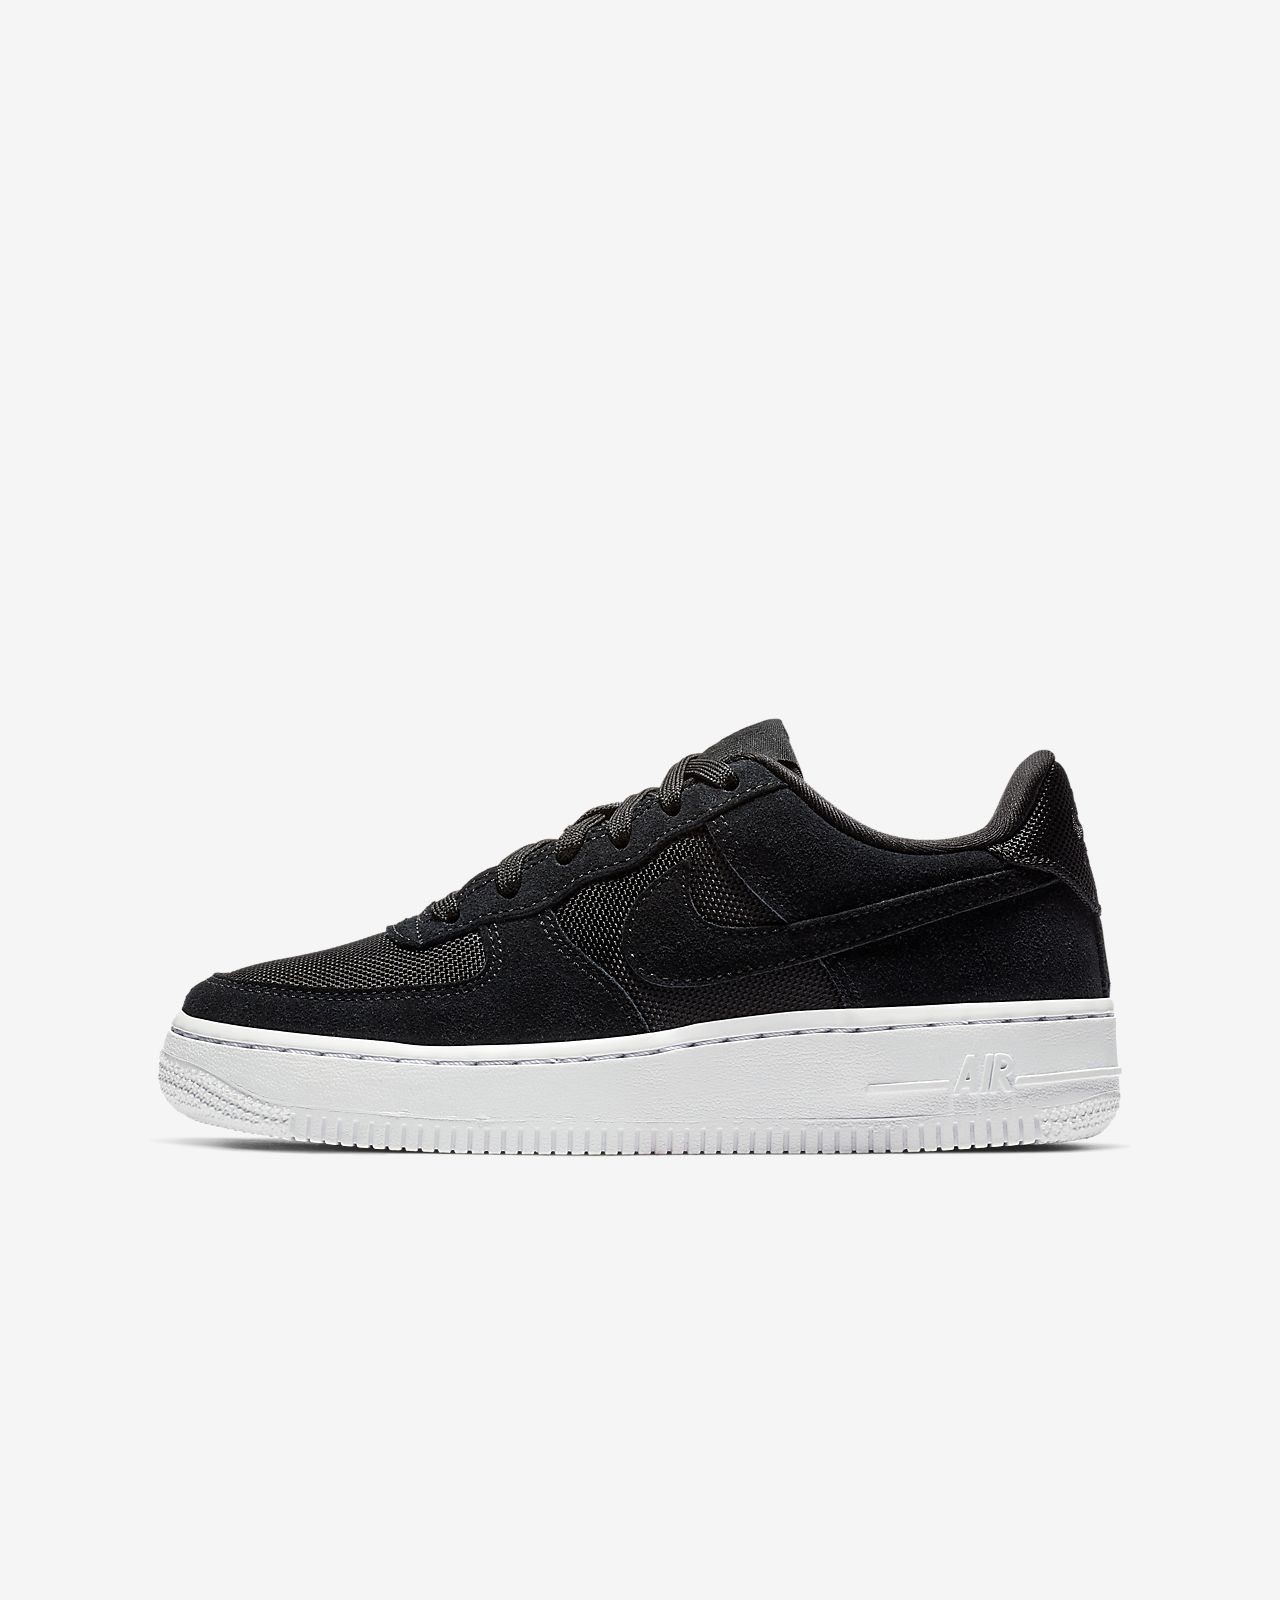 Nike Air Force 1-1 Older Kids' Shoe